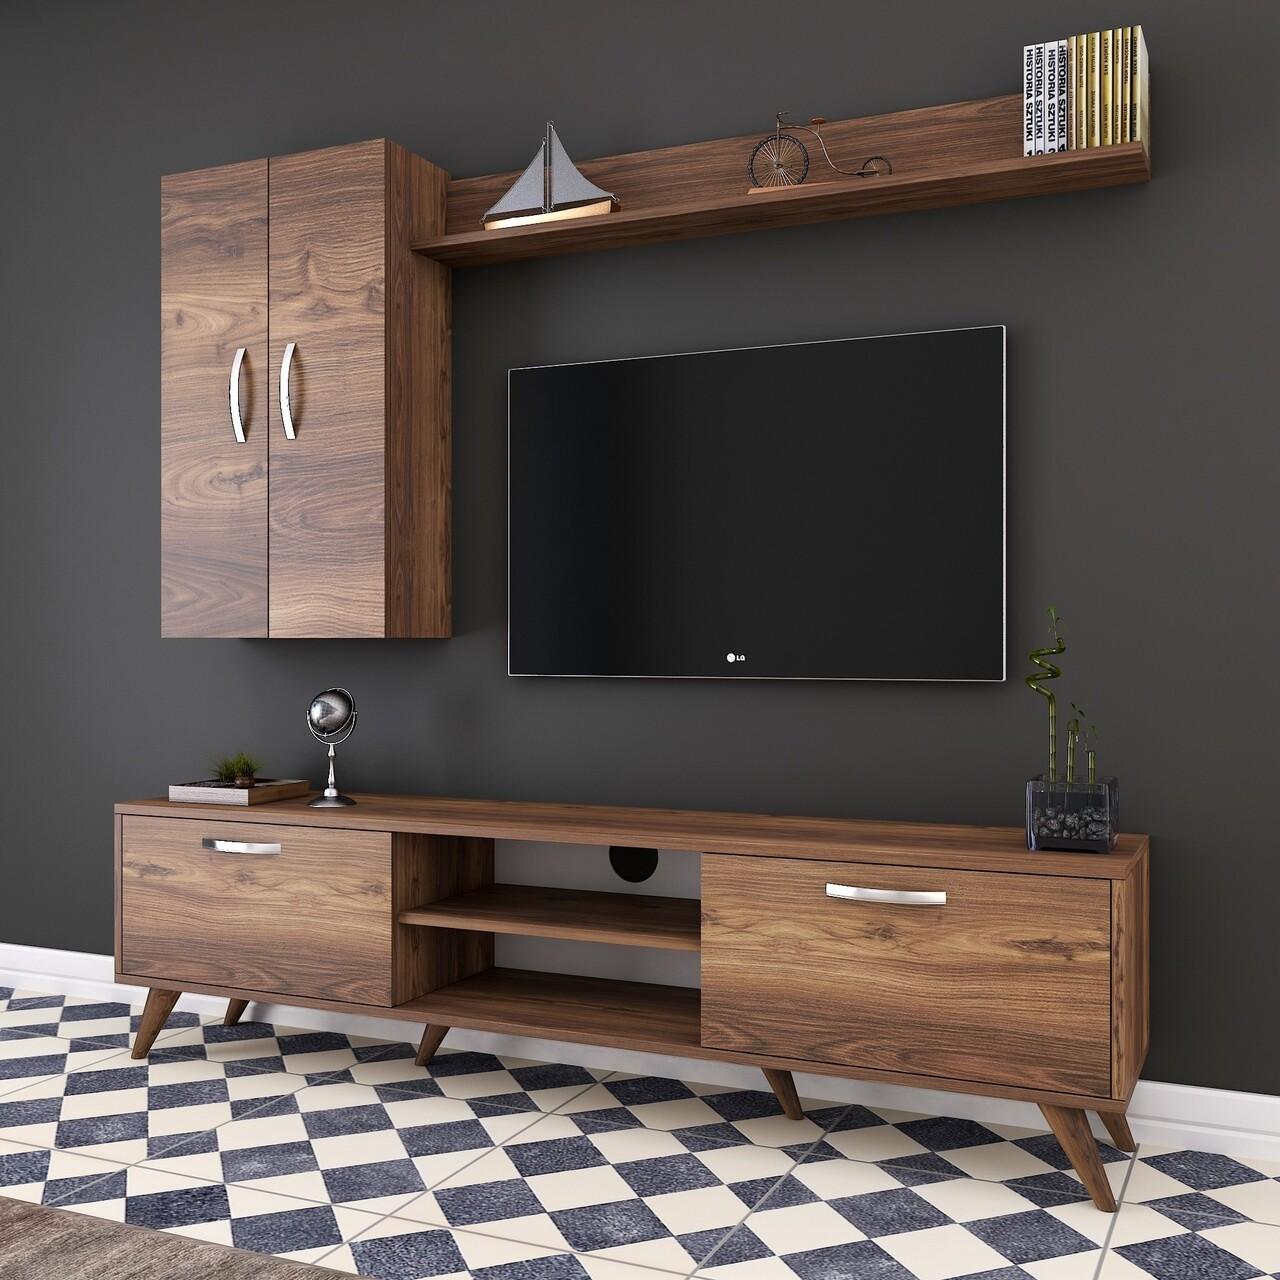 Comoda TV cu raft de perete si 2 cabinete M40 - 307, Wren, 180 x 35 x 48.6 cm/133 cm, walnut